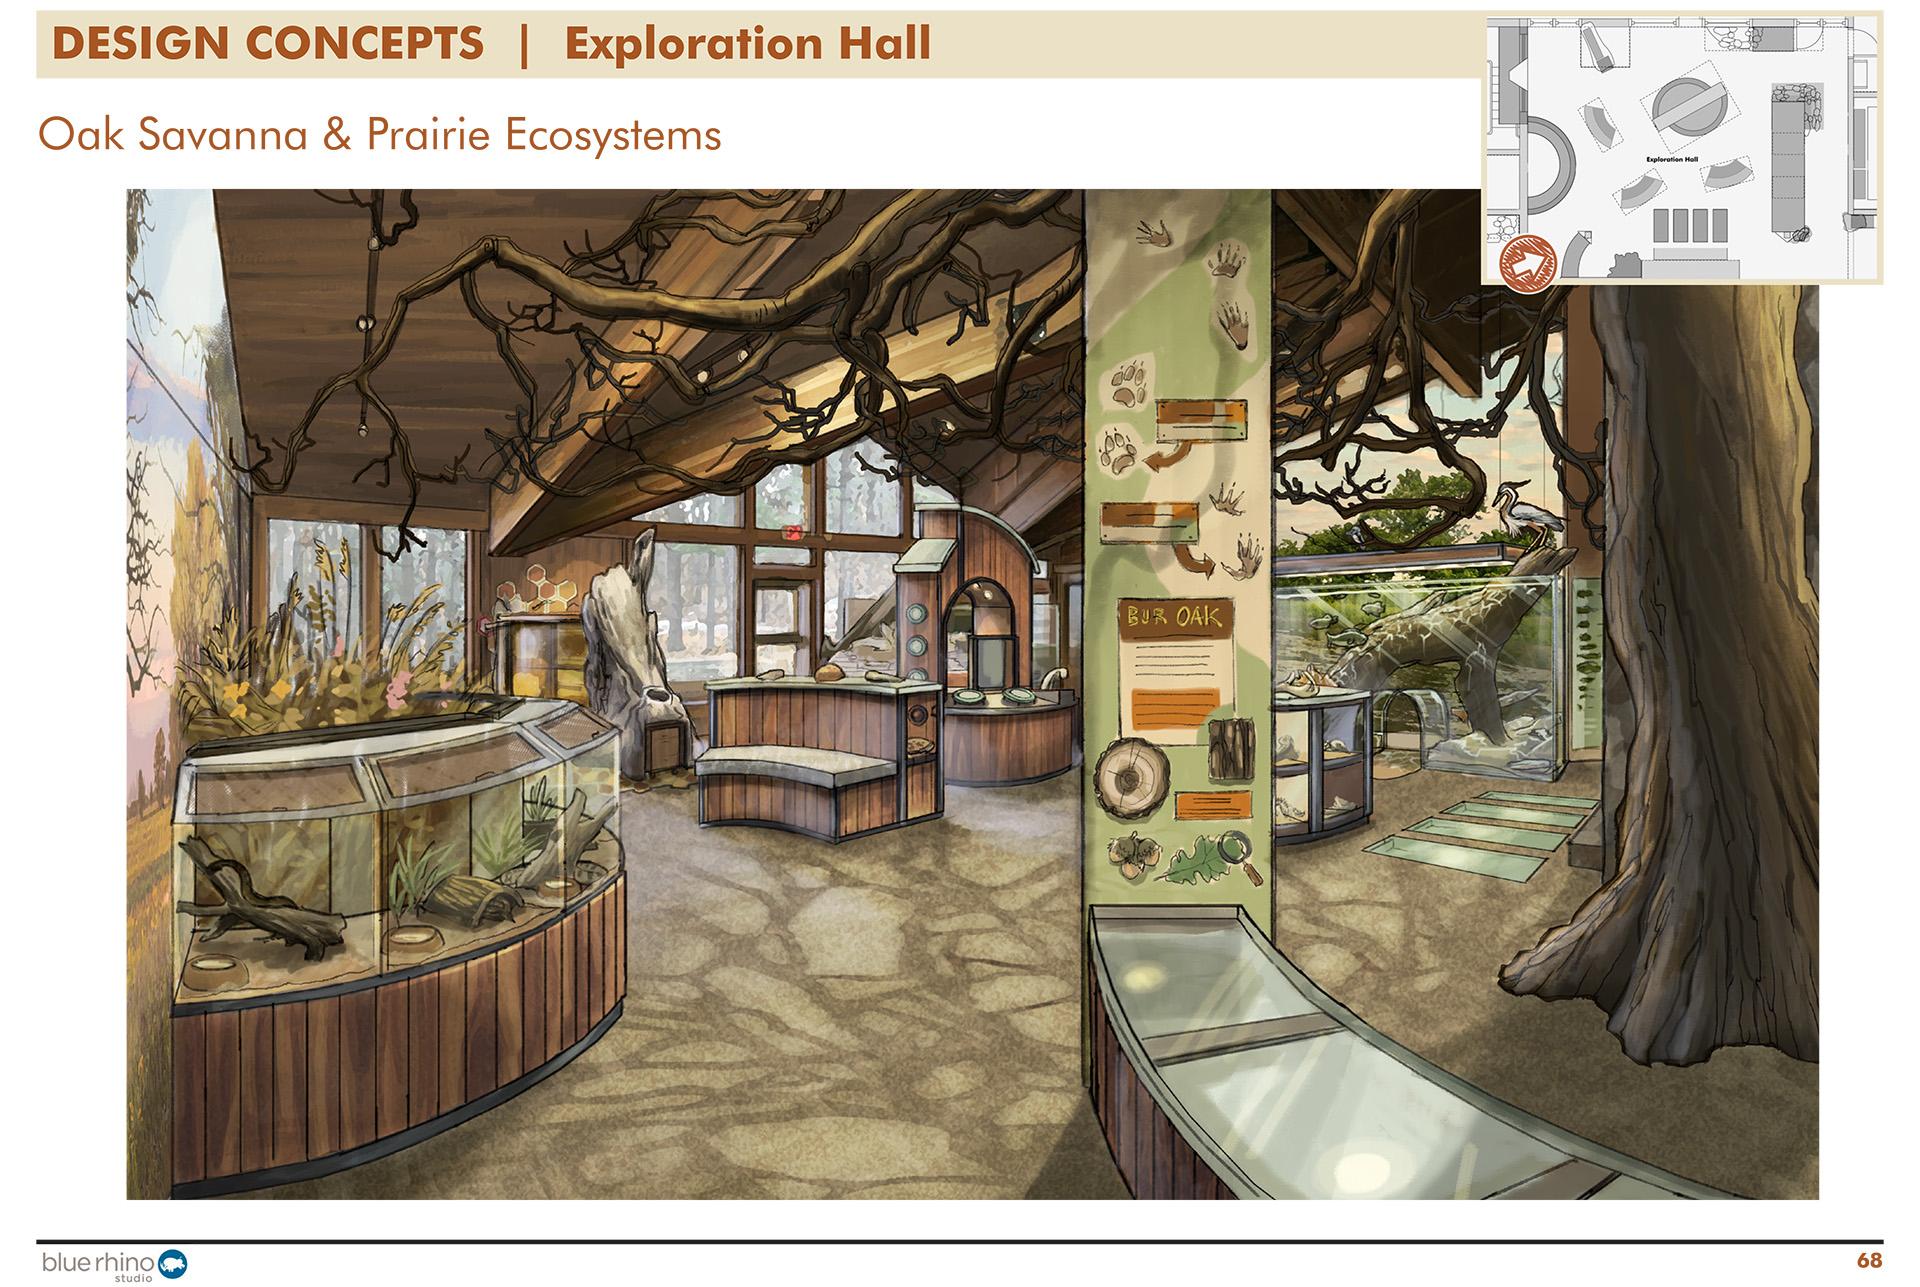 Exploration Hall, Window View